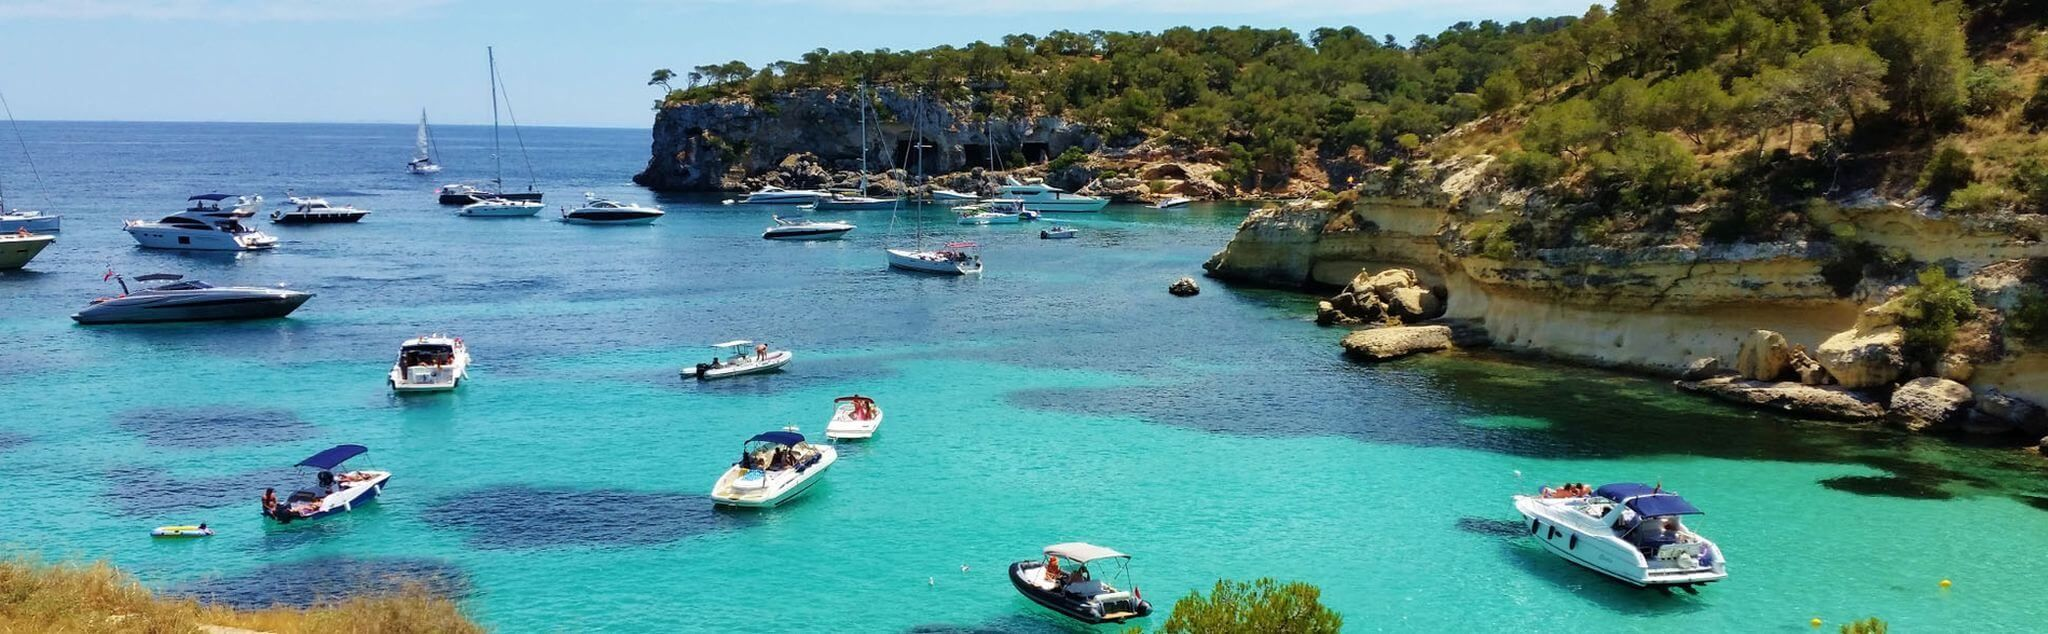 Sport di Motori en Islas Baleares